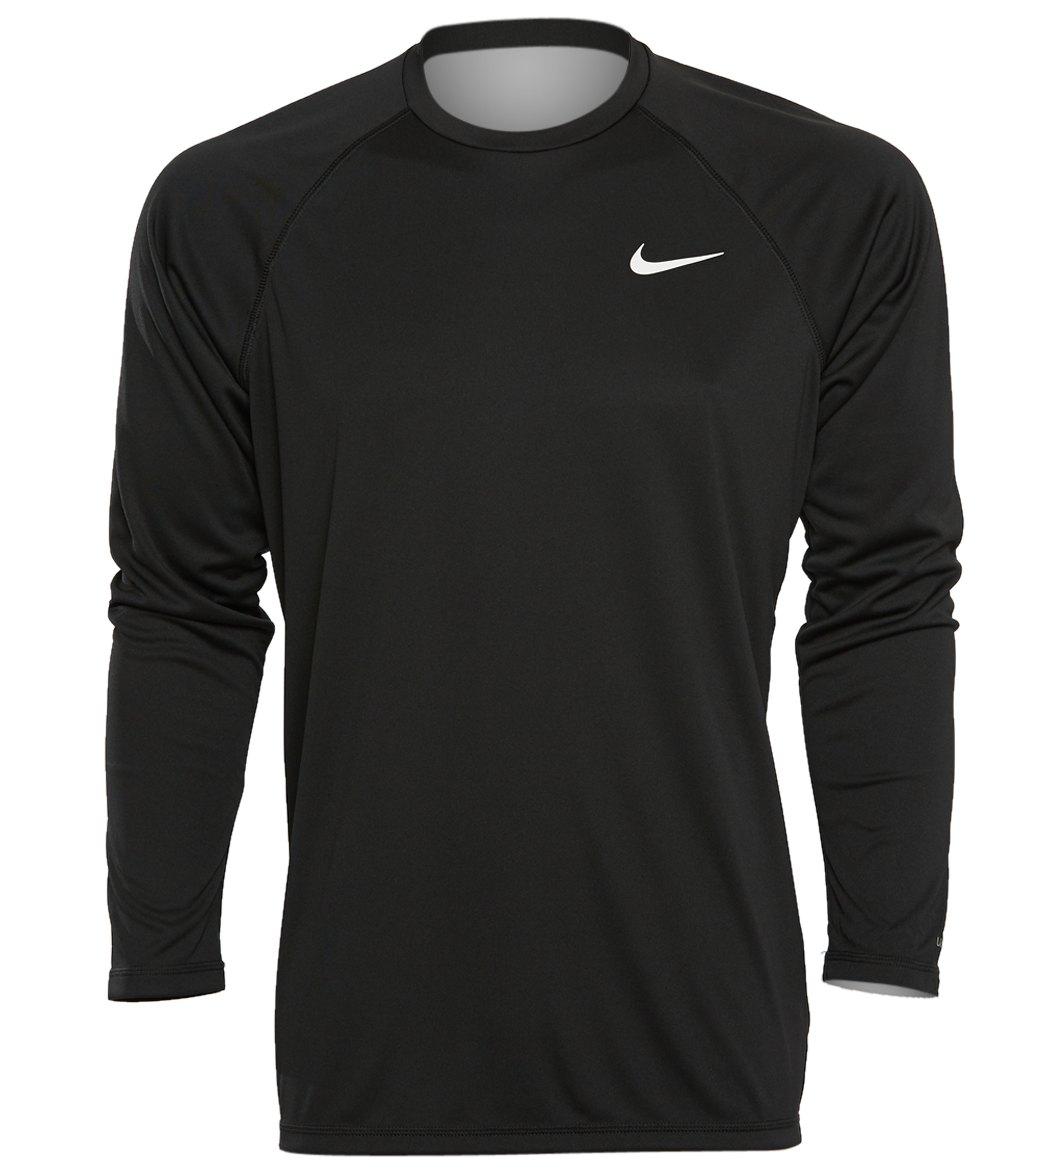 d703684b7 Nike Men's Long Sleeve Hydro Rash Guard at SwimOutlet.com